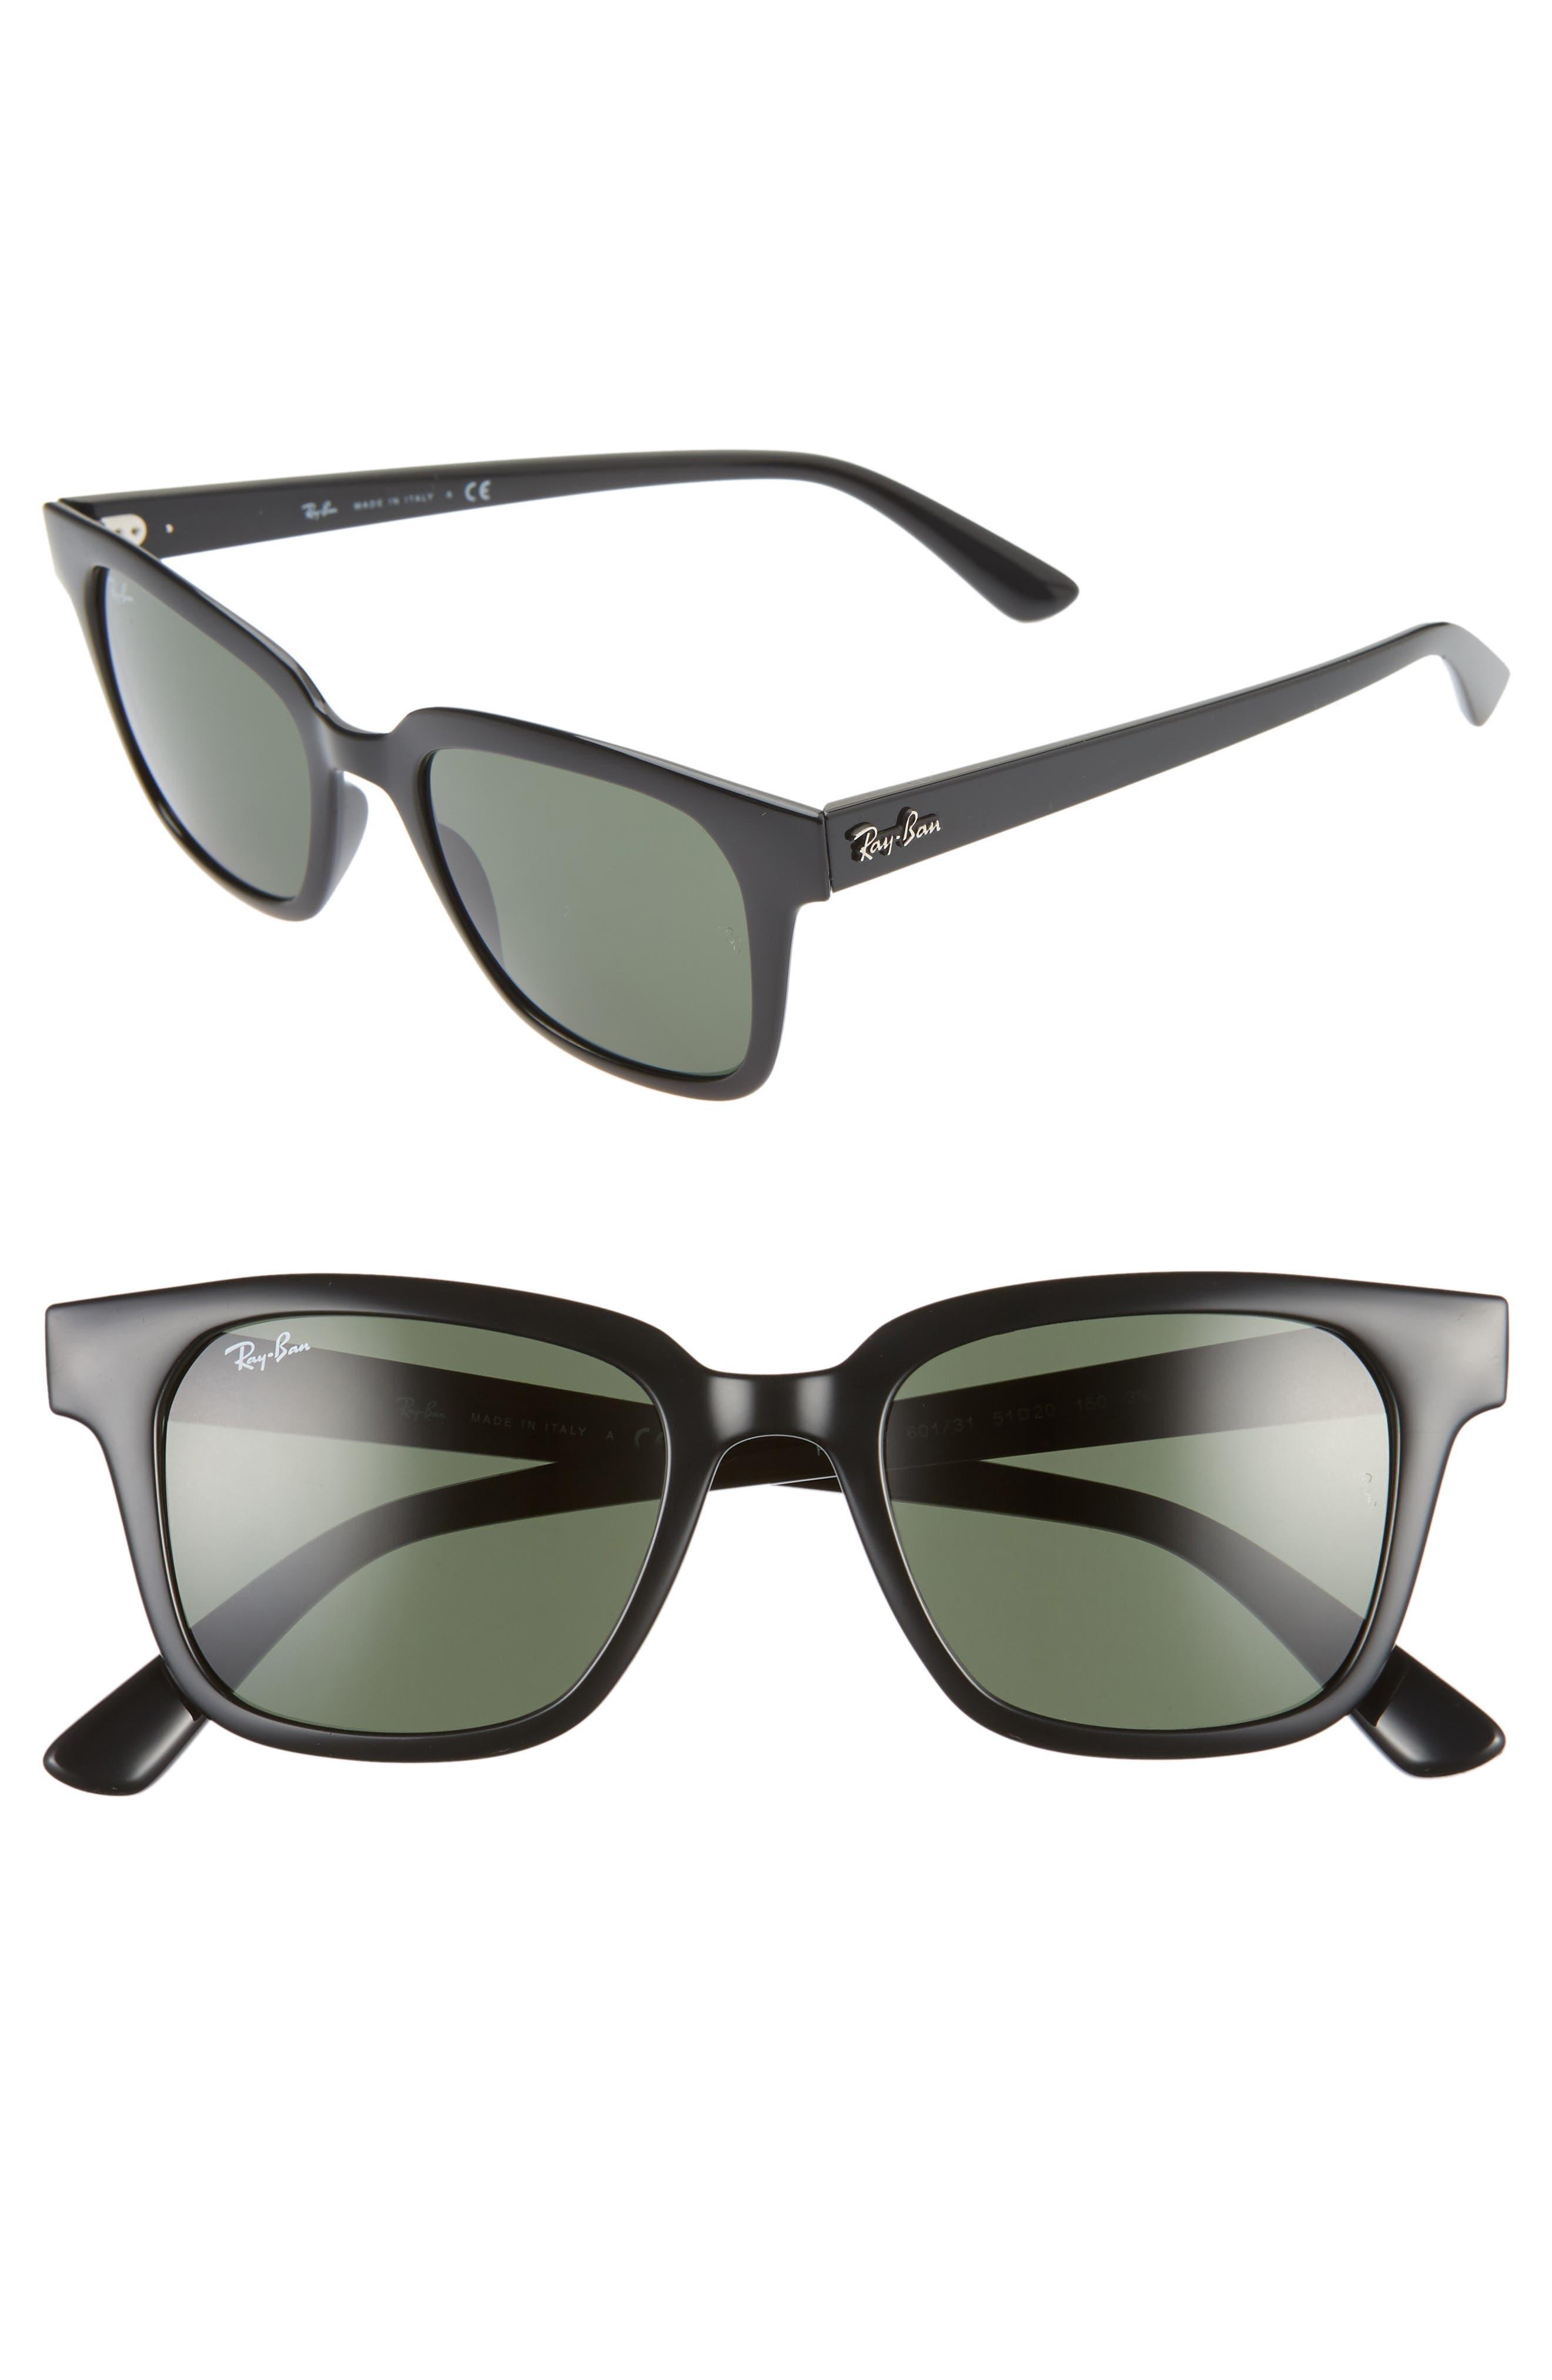 Ray Ban Sunglasses 51MM WAYFARER SUNGLASSES